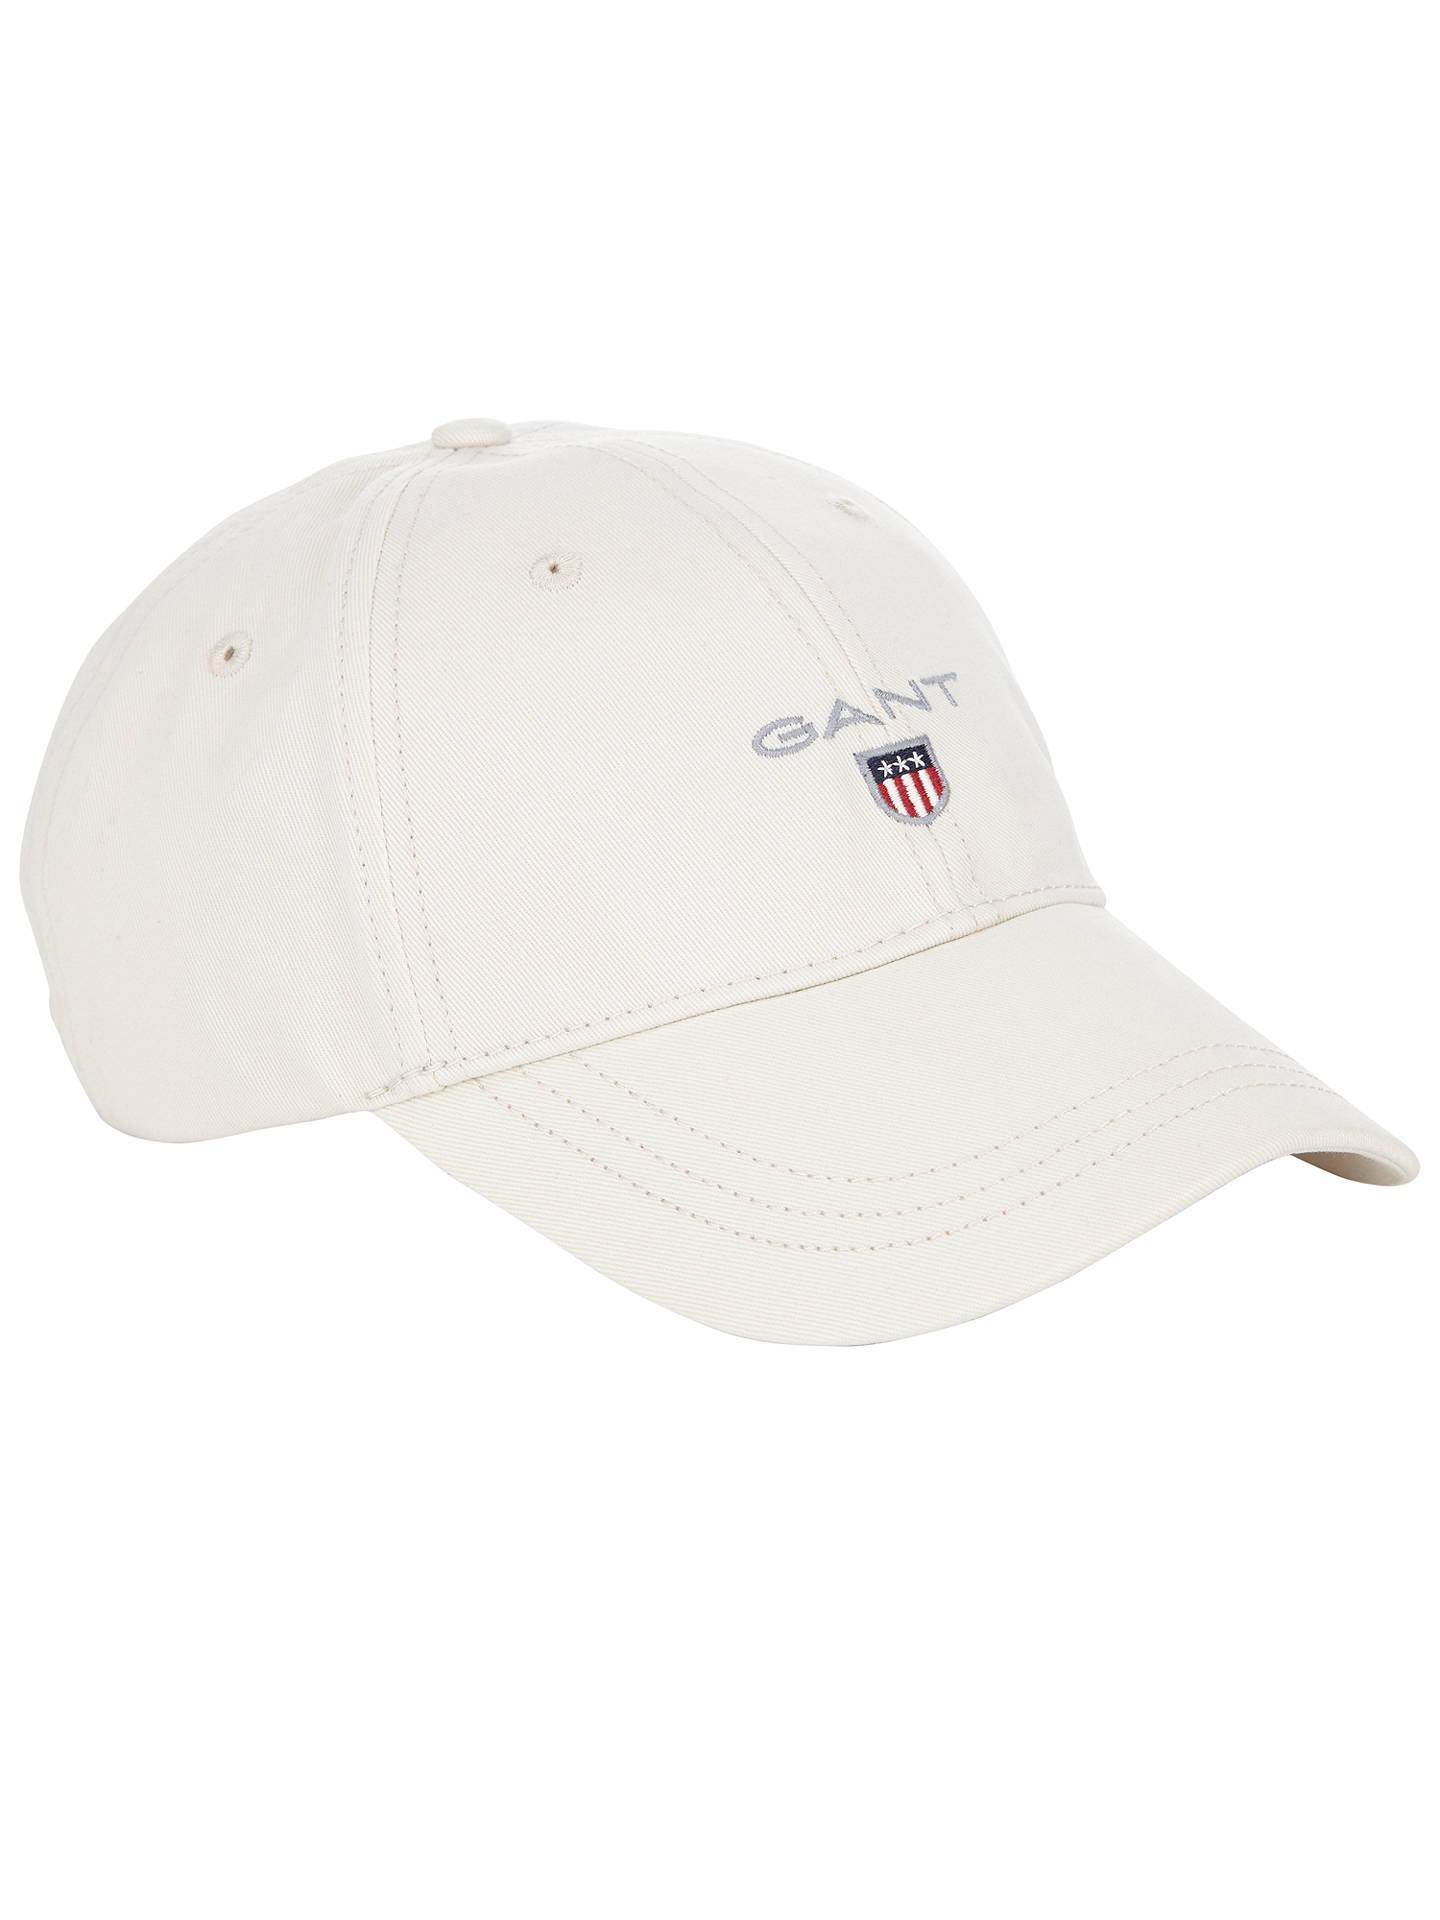 bea4652b6dcf Buy Gant Cotton Twill Baseball Cap